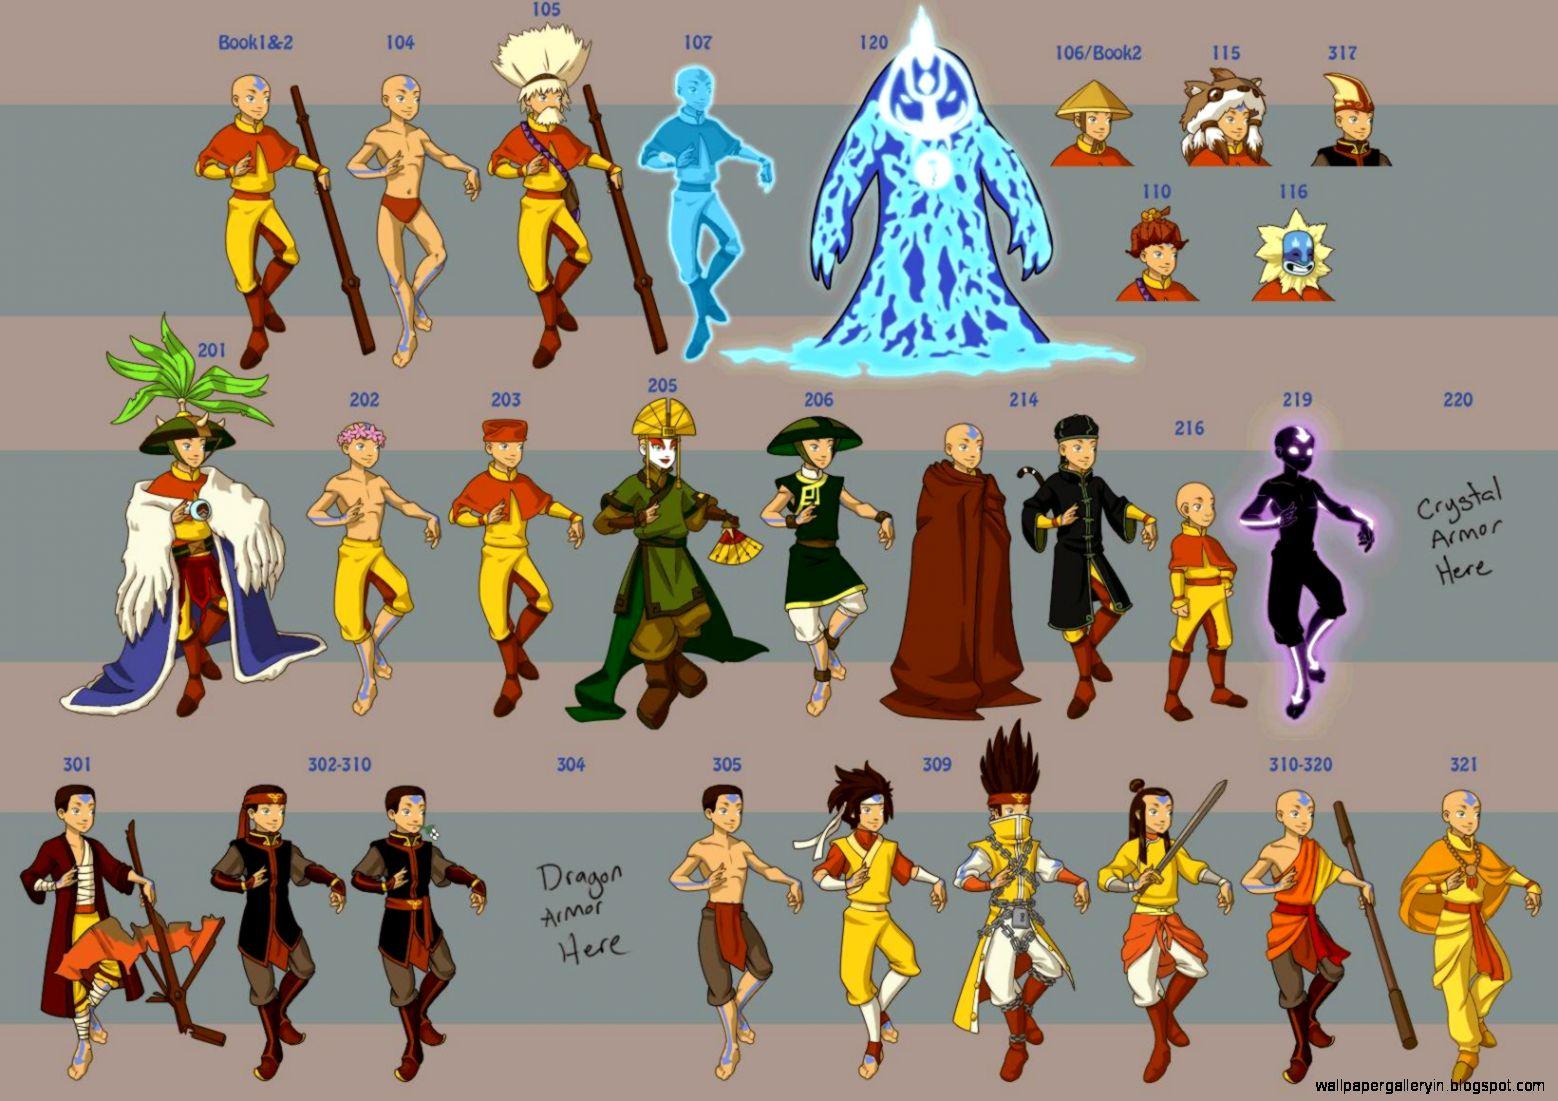 Avatar Aang The Last Airbender Wallpaper